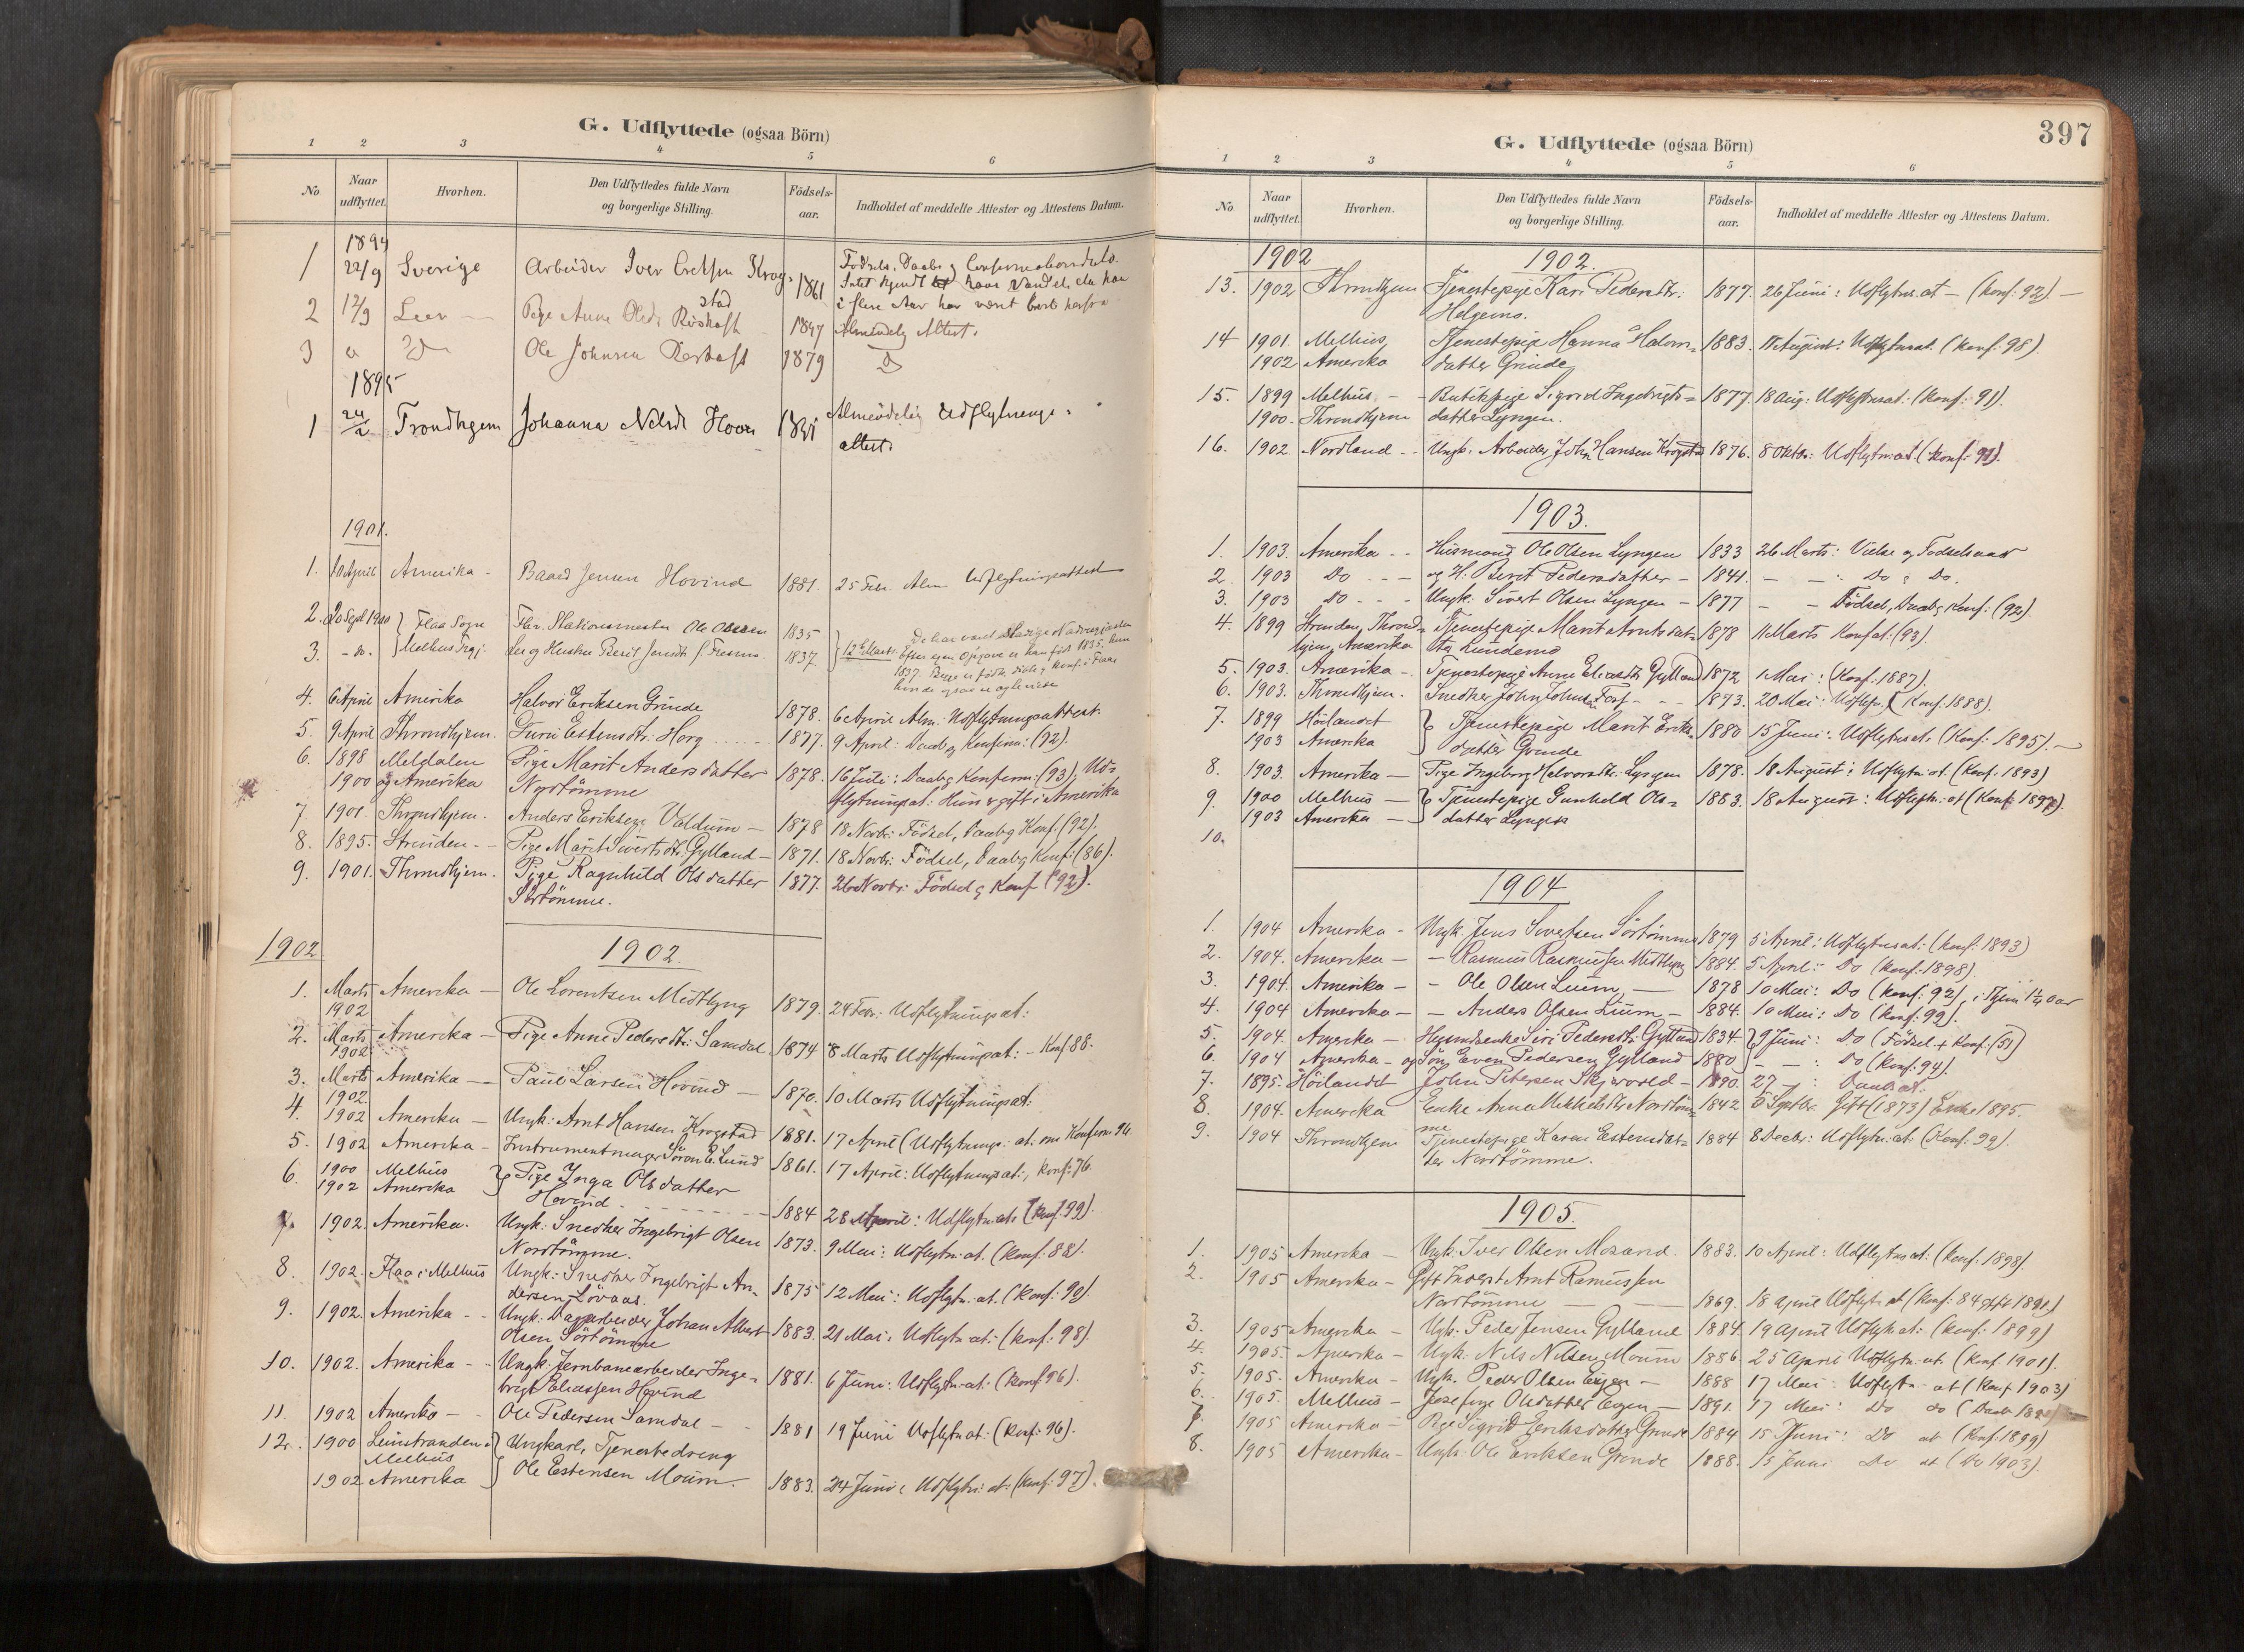 SAT, Ministerialprotokoller, klokkerbøker og fødselsregistre - Sør-Trøndelag, 692/L1105b: Parish register (official) no. 692A06, 1891-1934, p. 397